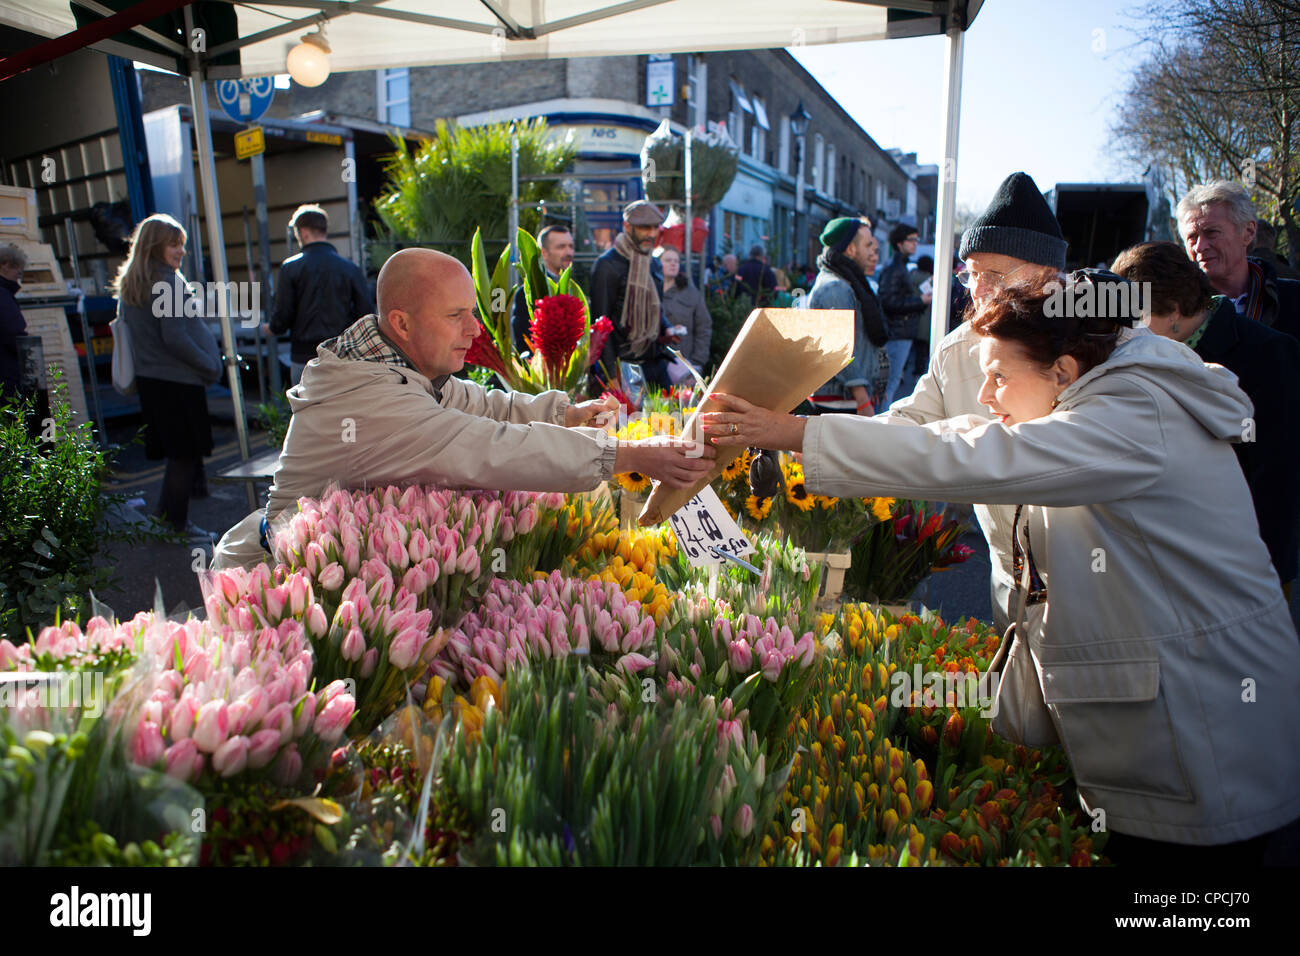 Columbia Road Flower Market Photo Stock